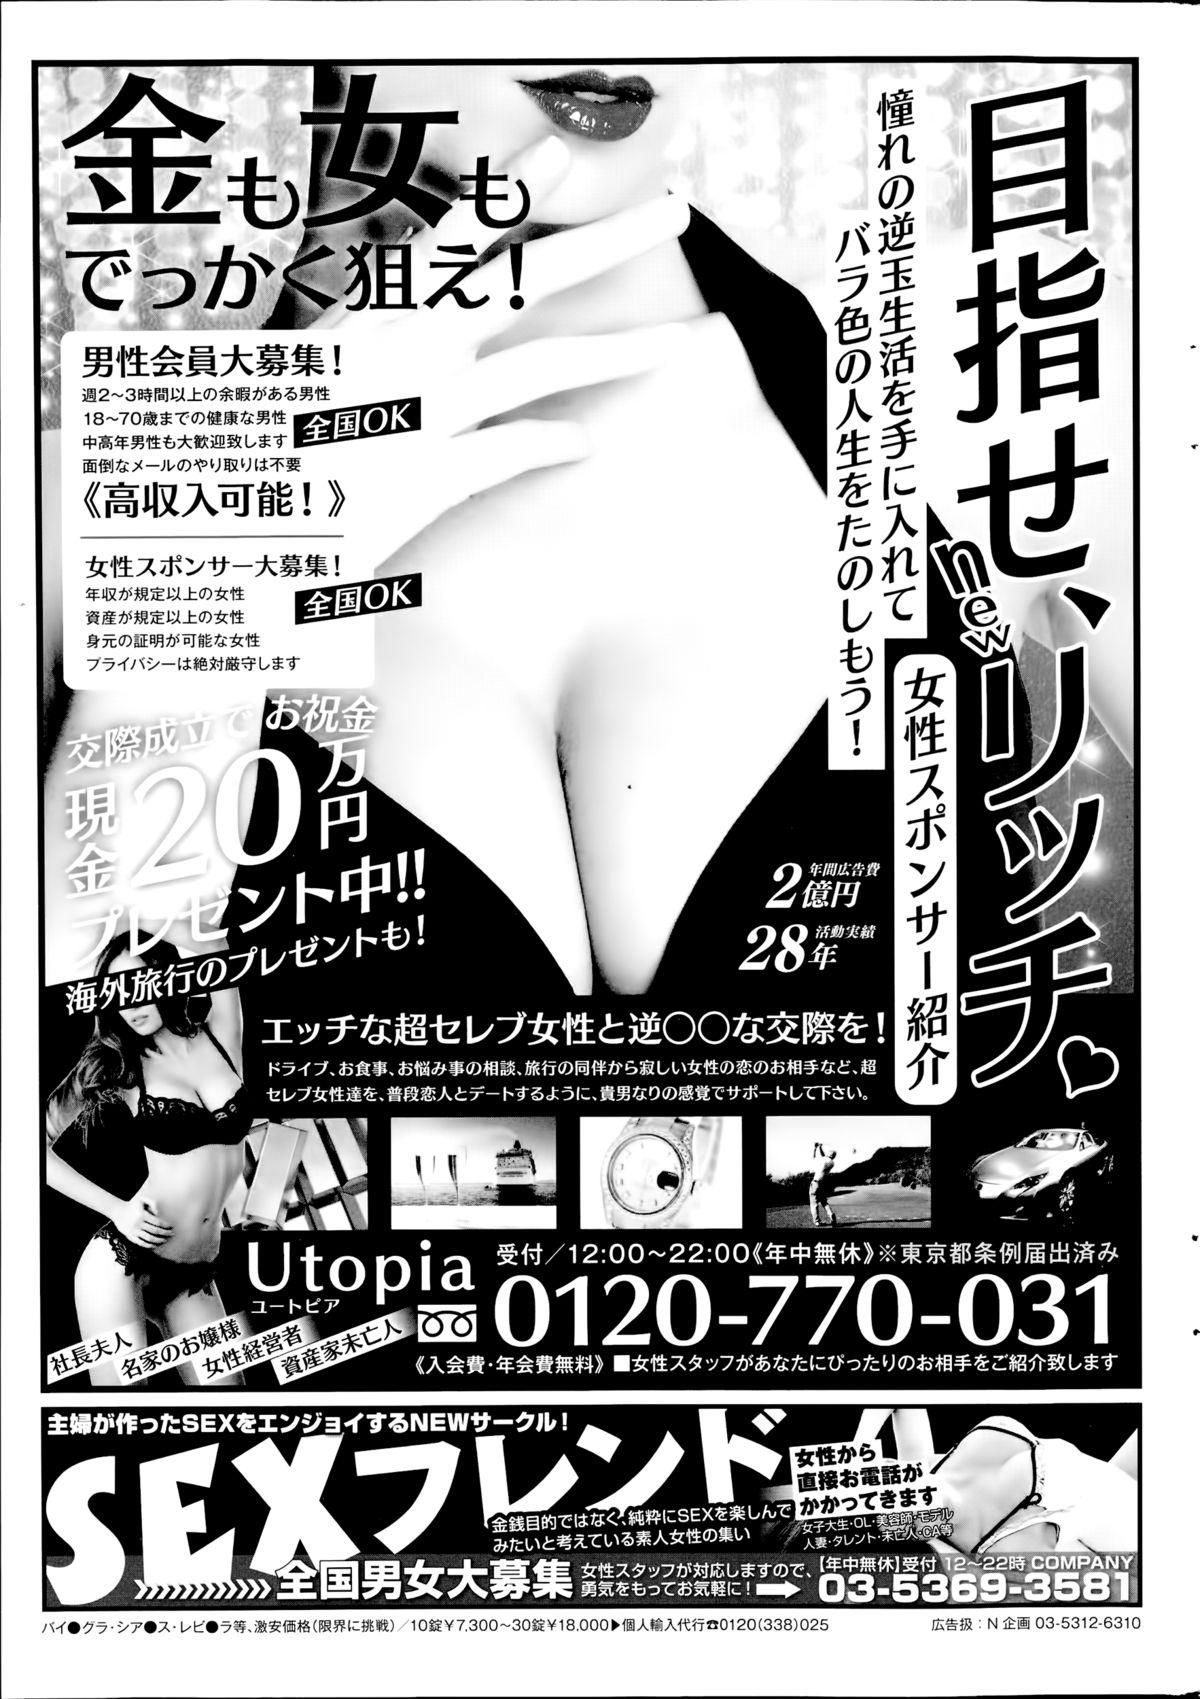 COMIC SIGMA 2014-09 Vol.81 258